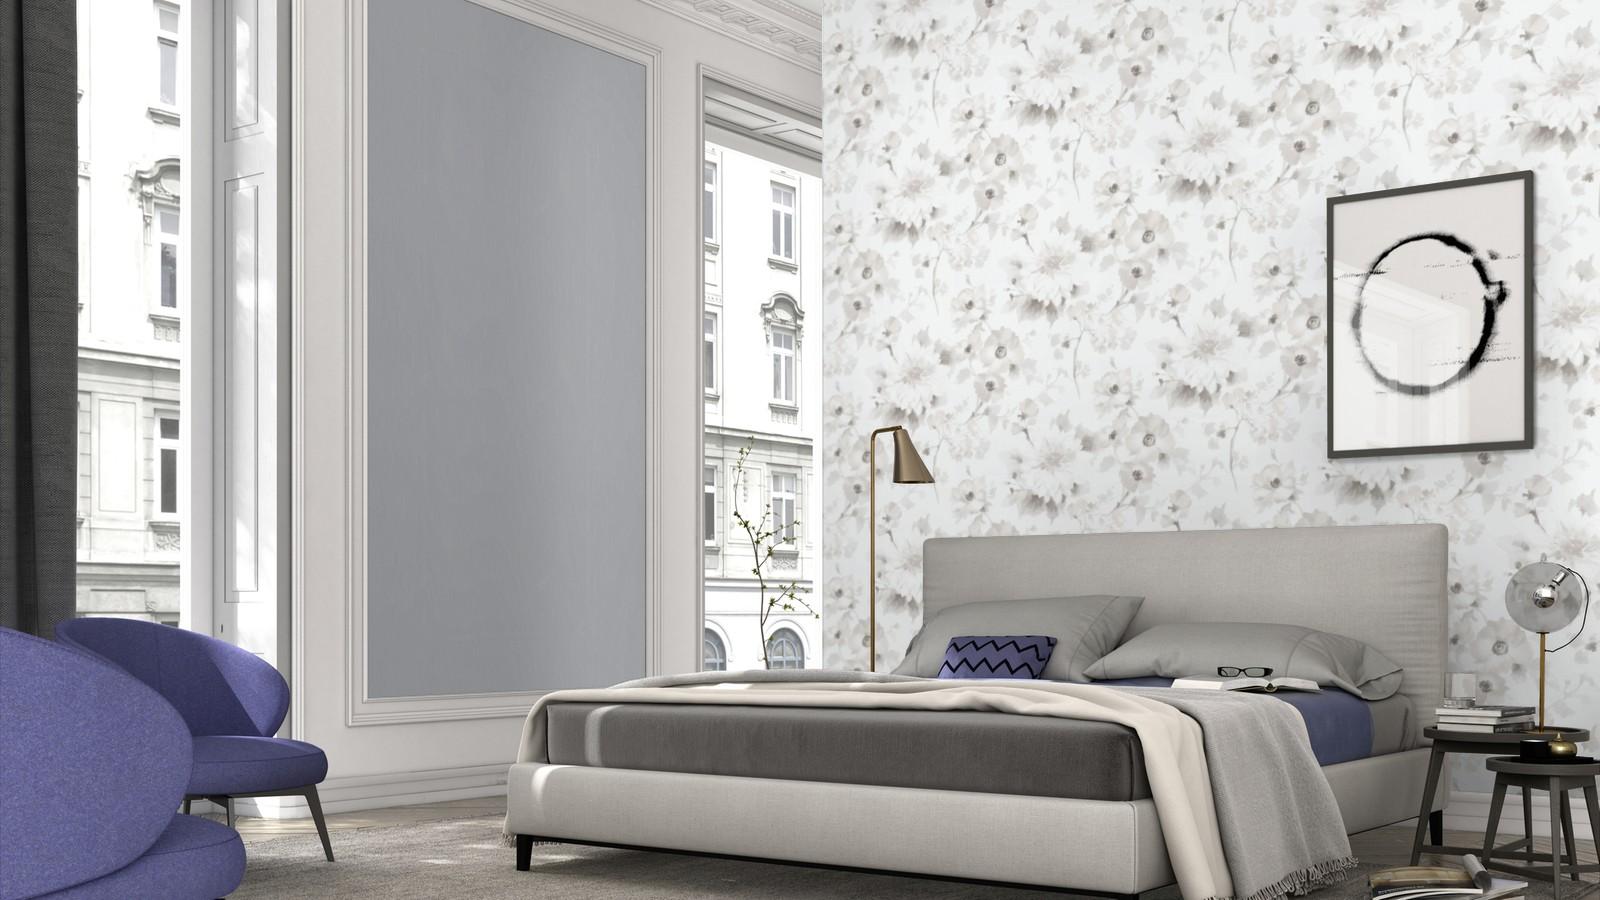 Обои Erismann GMK Fashion for Walls New 10051-31 (Эрисман)